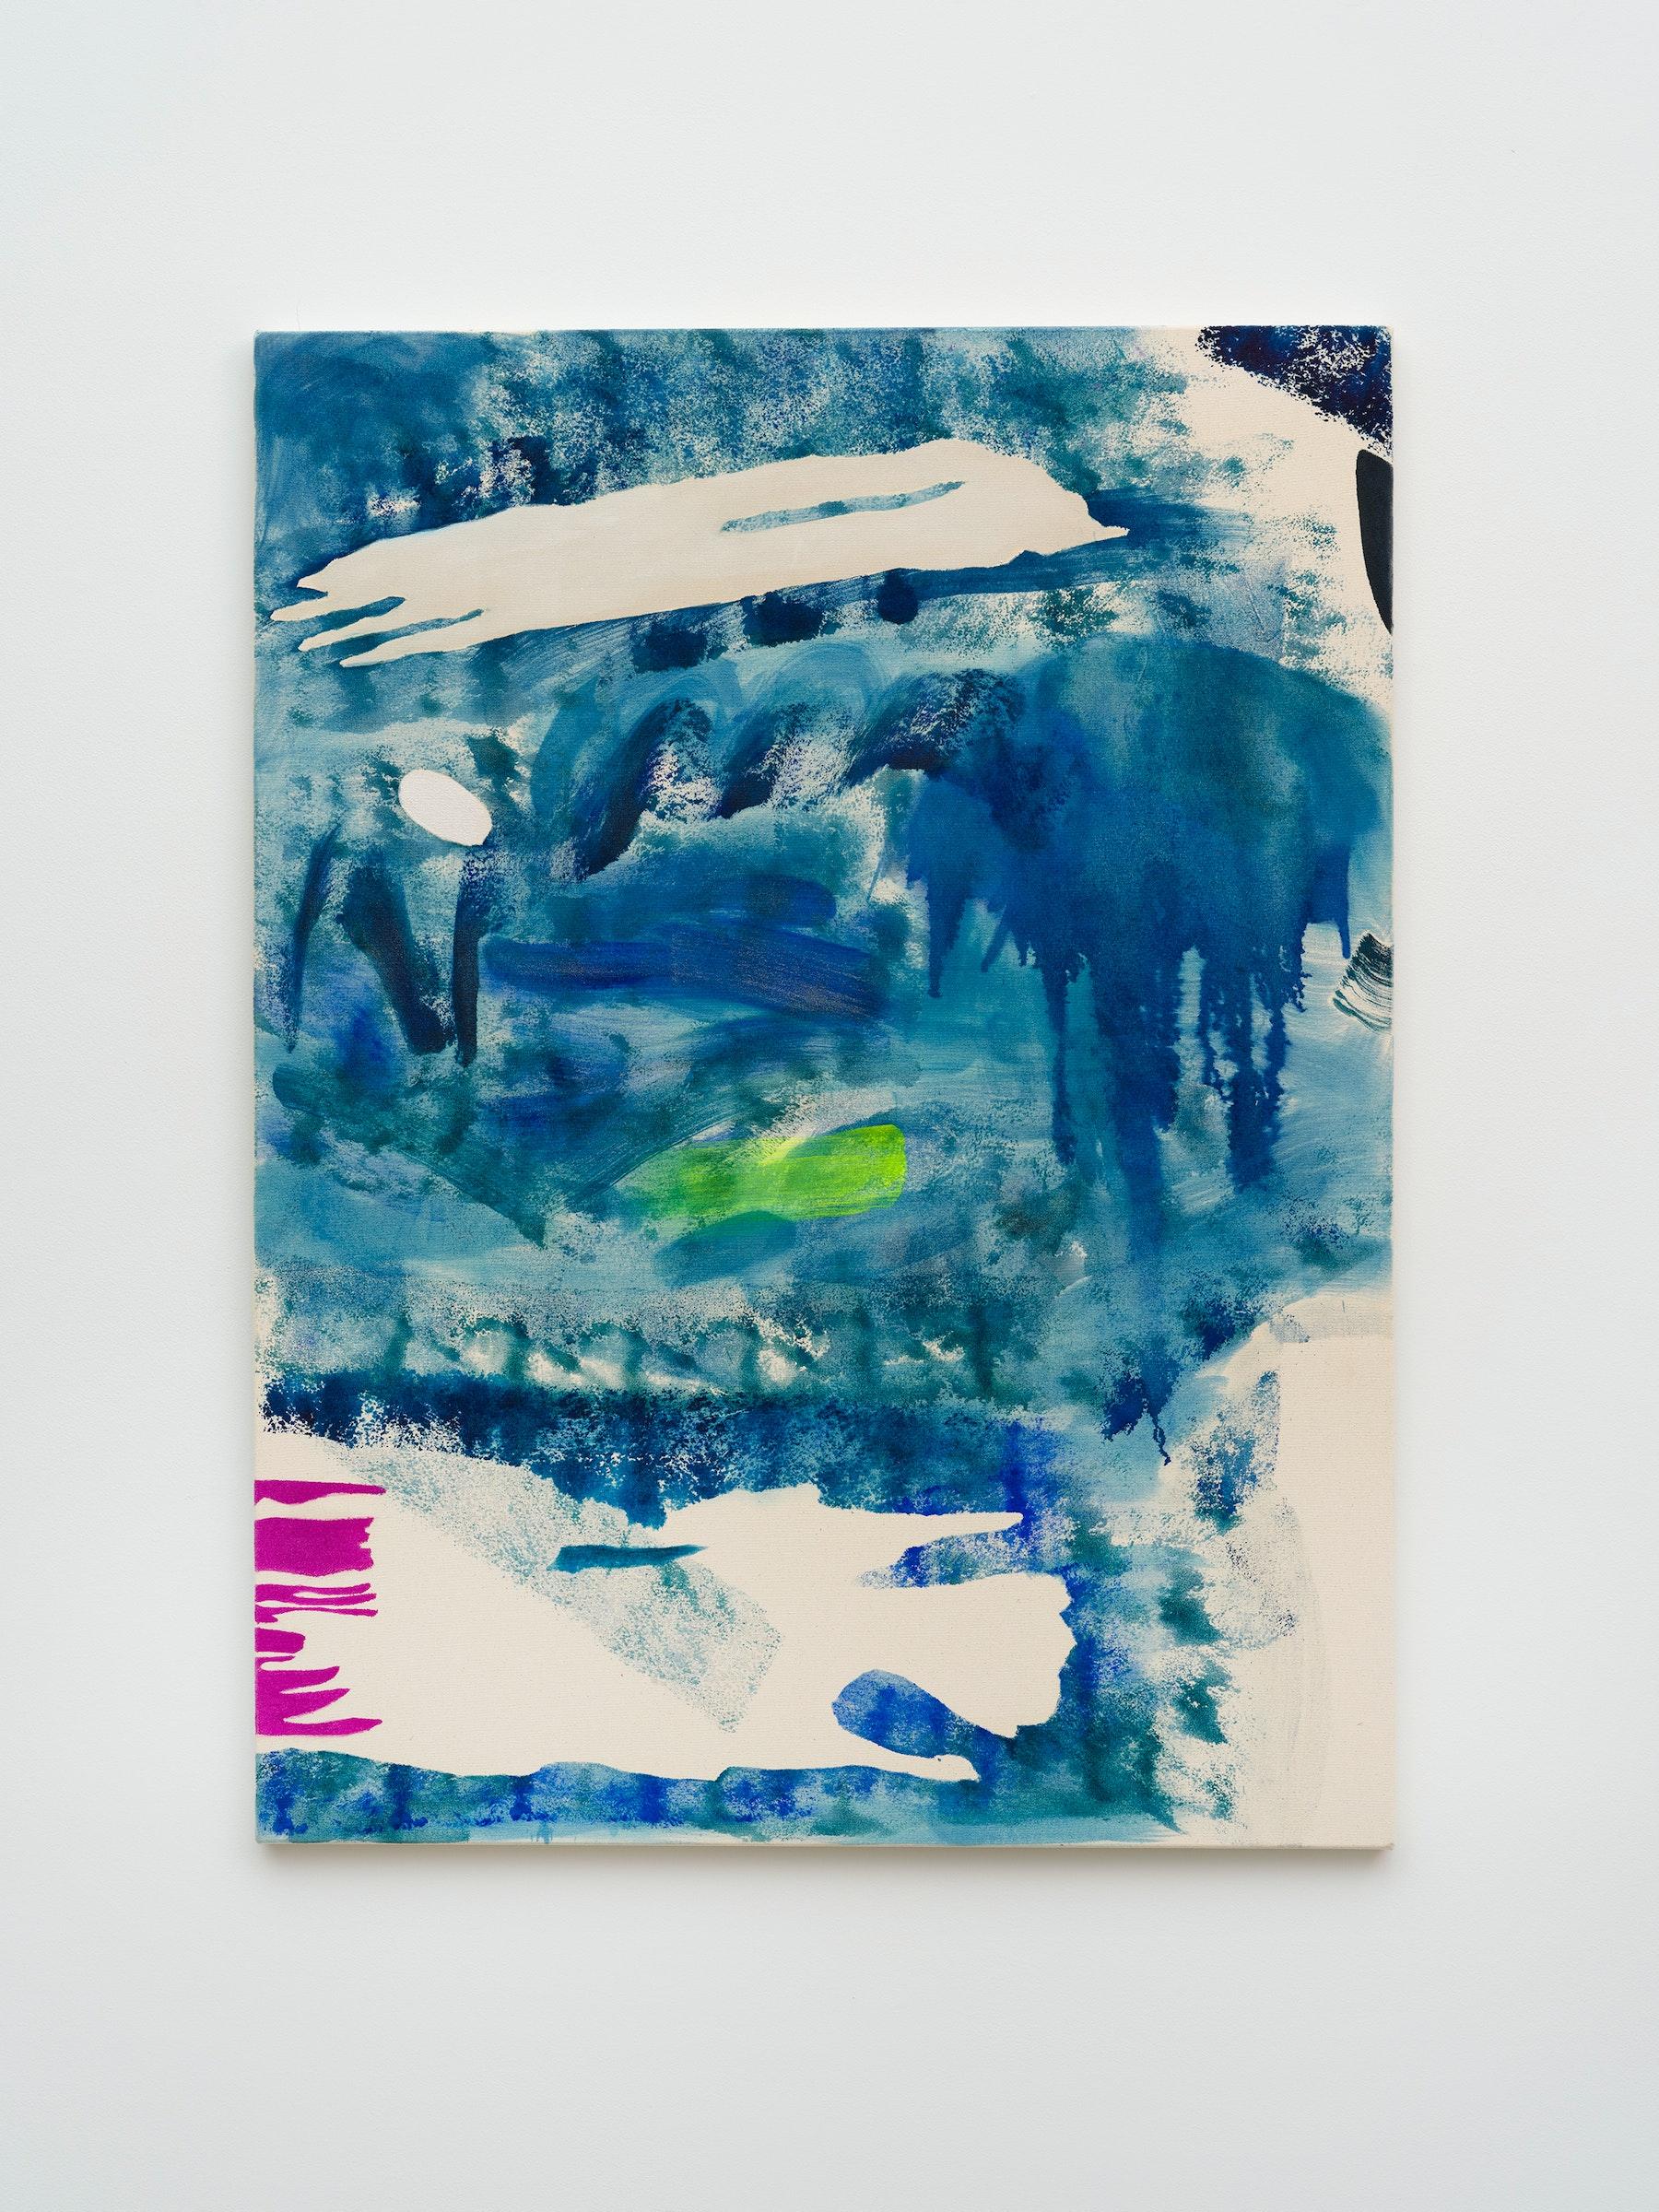 "Monique Van Genderen ""Snapshot 3,"" 2021 Oil on canvas 48"" x 36"" [HxW] (121.92 x 91.44 cm) Inventory #VGE415 Courtesy of the artist and Vielmetter Los Angeles Photo credit: Jeff McLane"